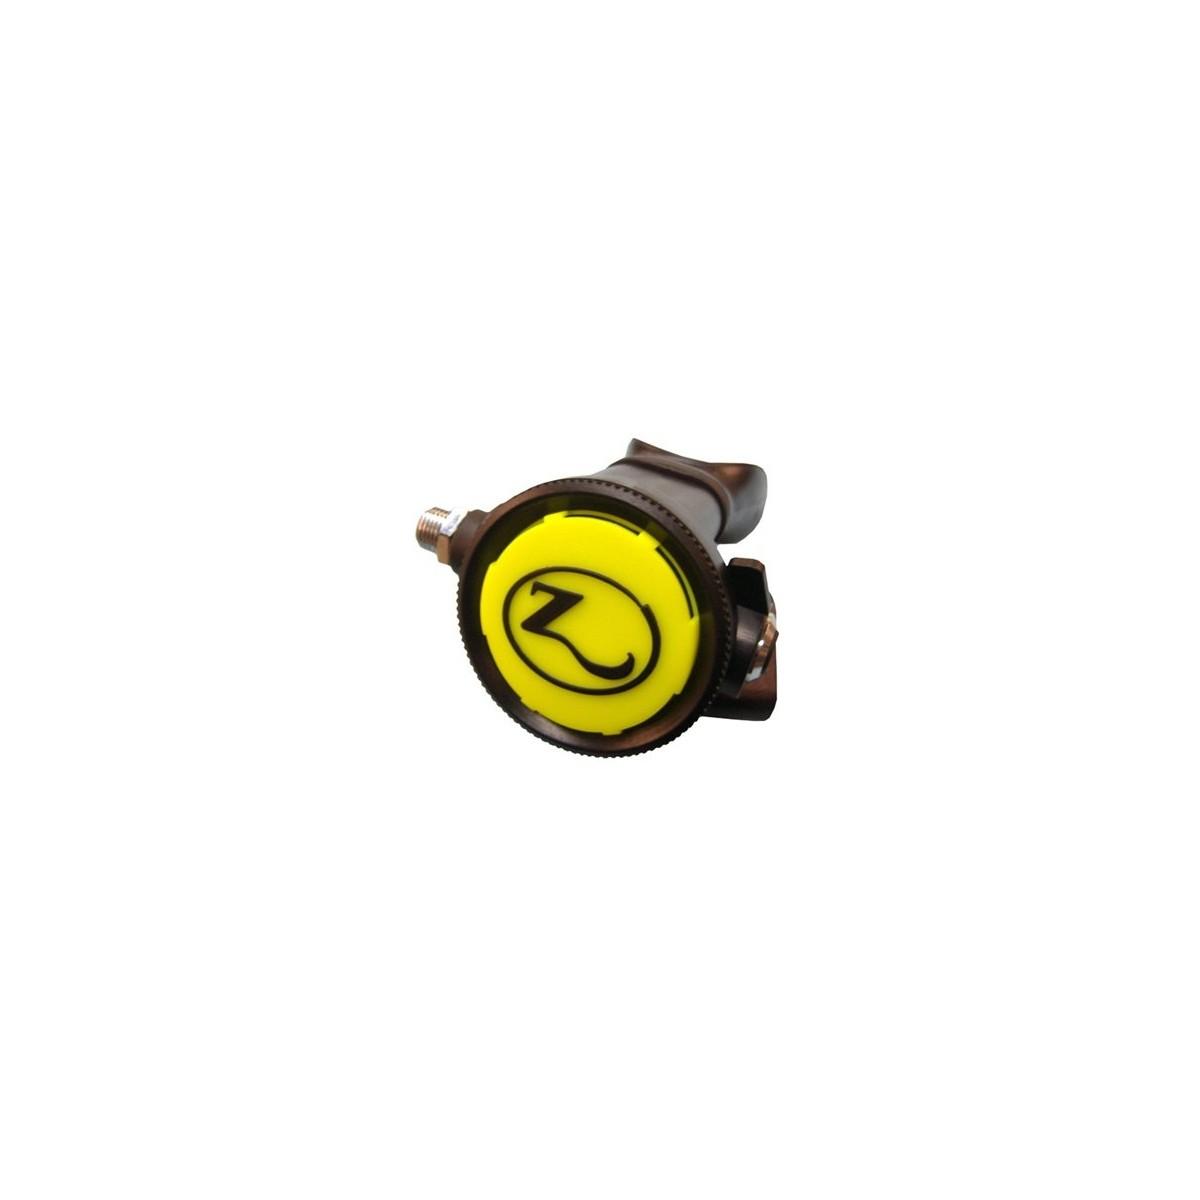 "Zeagle Scuba Regulator-Envoy Octo- 36"" Hose-Yellow"